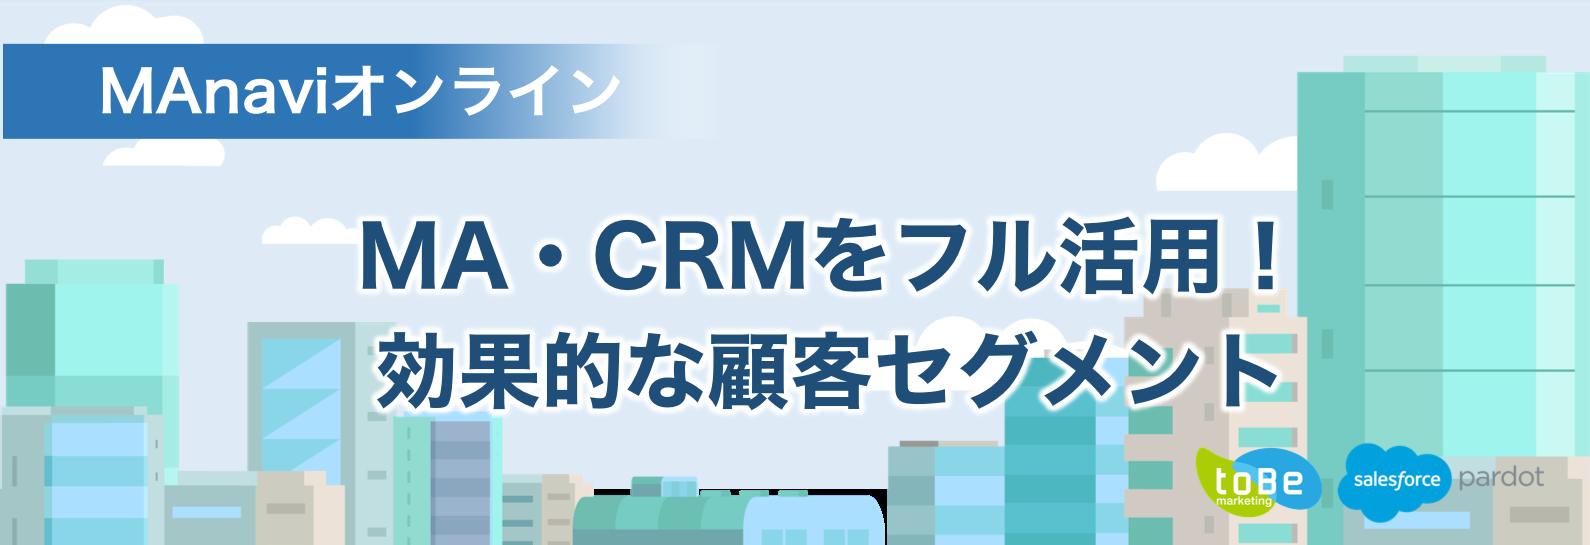 【MAnaviオンライン】MA・CRMをフル活用!効果的な顧客セグメント